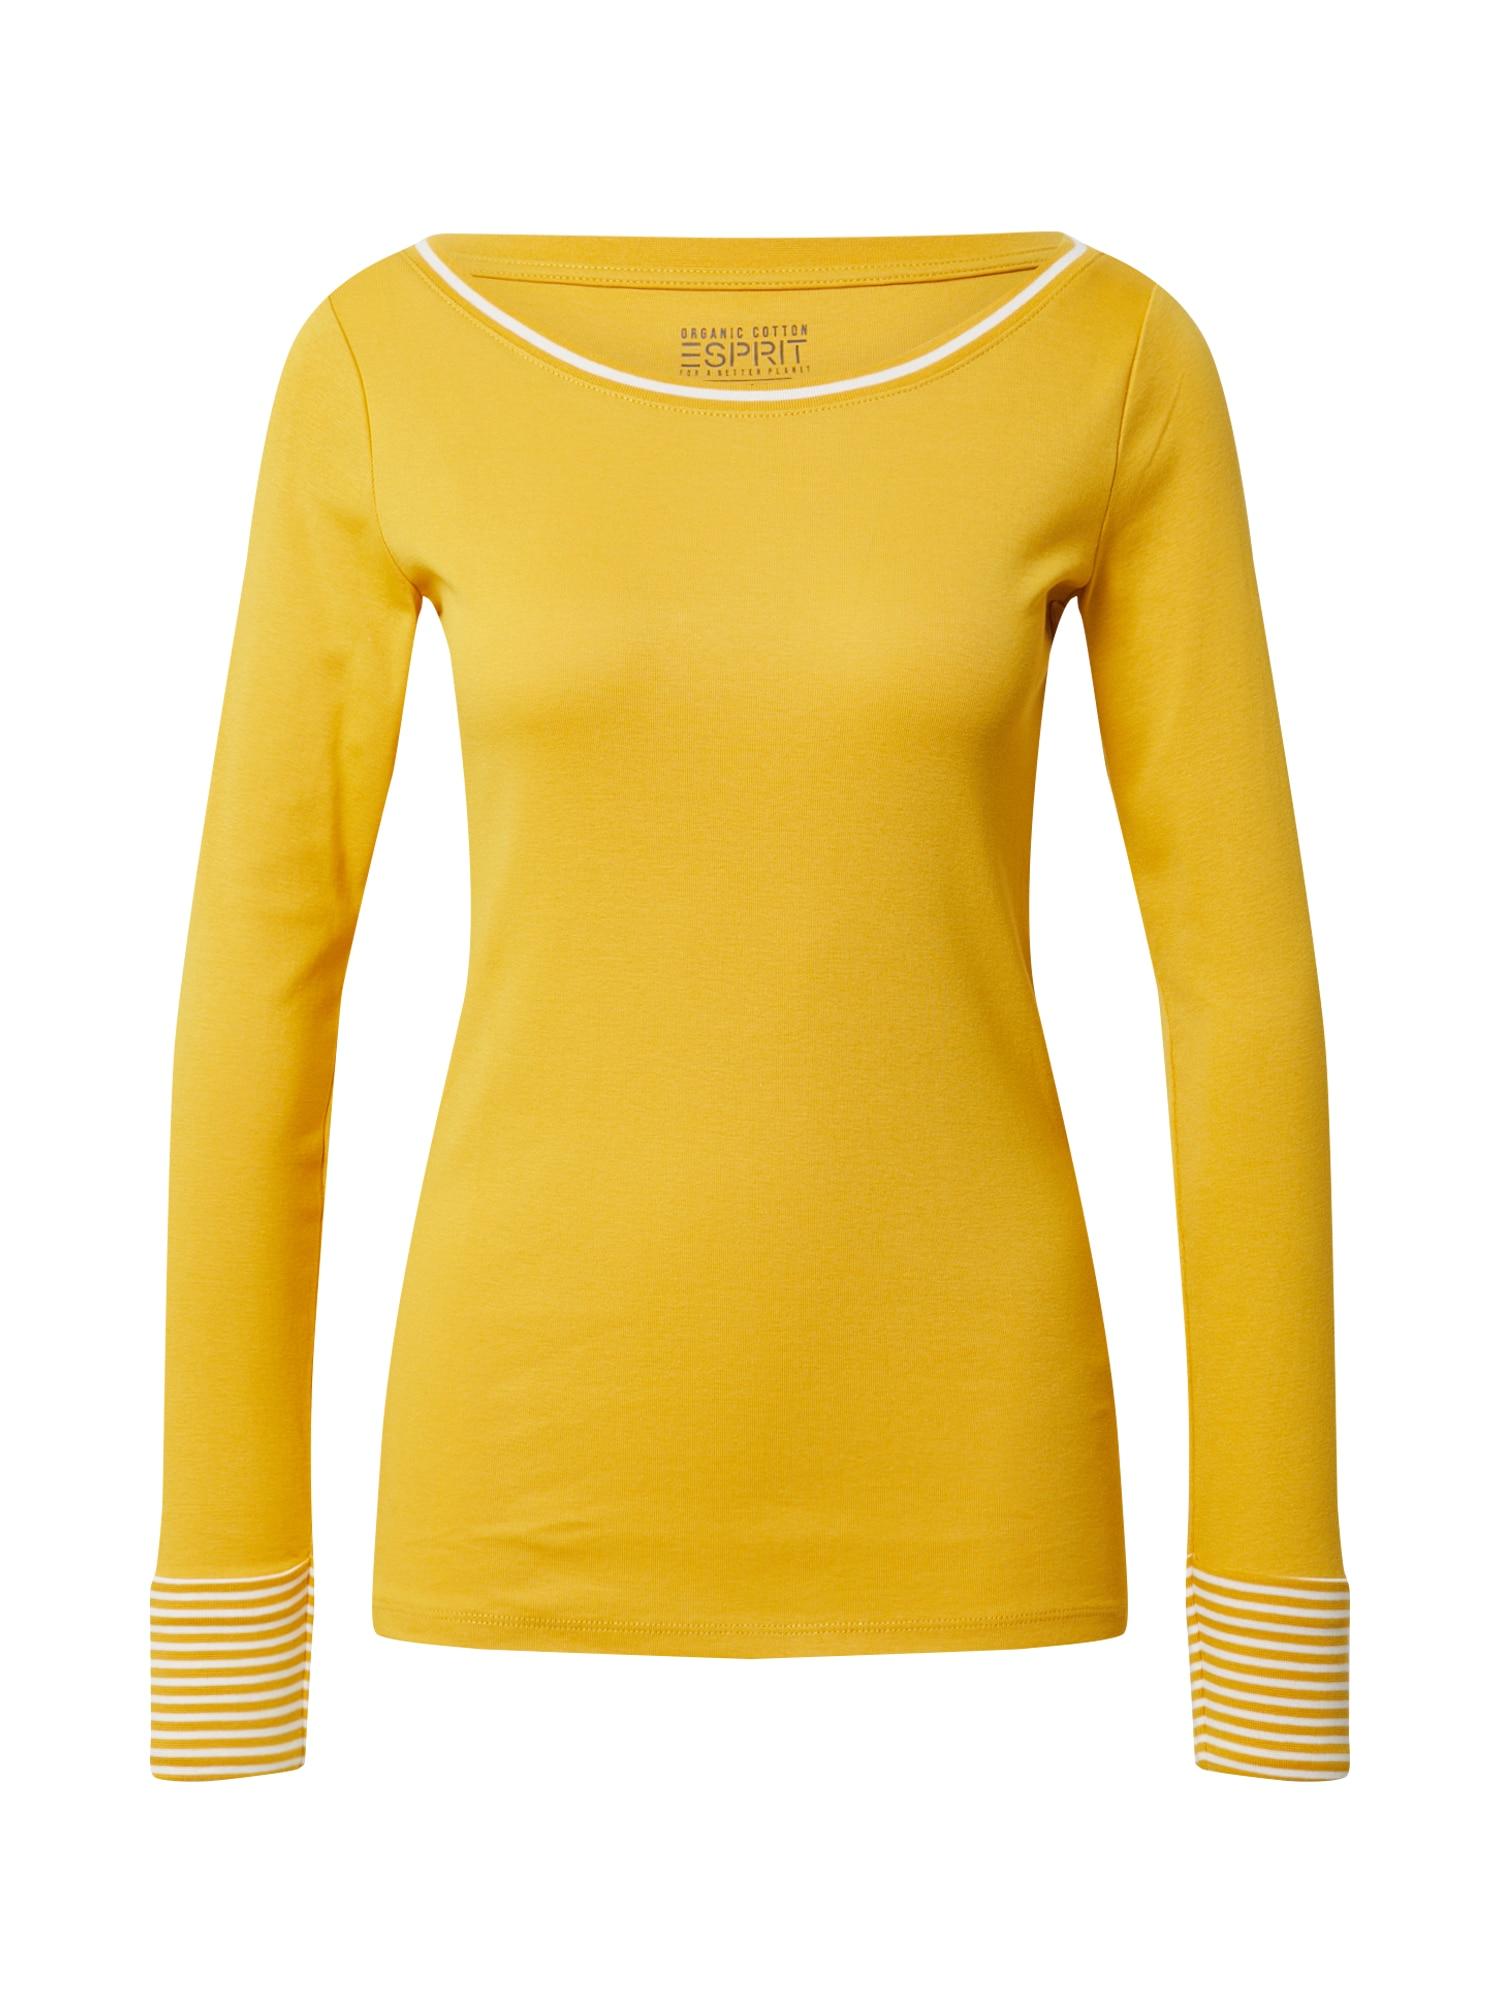 ESPRIT Tričko 'NOOS Rib'  bílá / zlatě žlutá